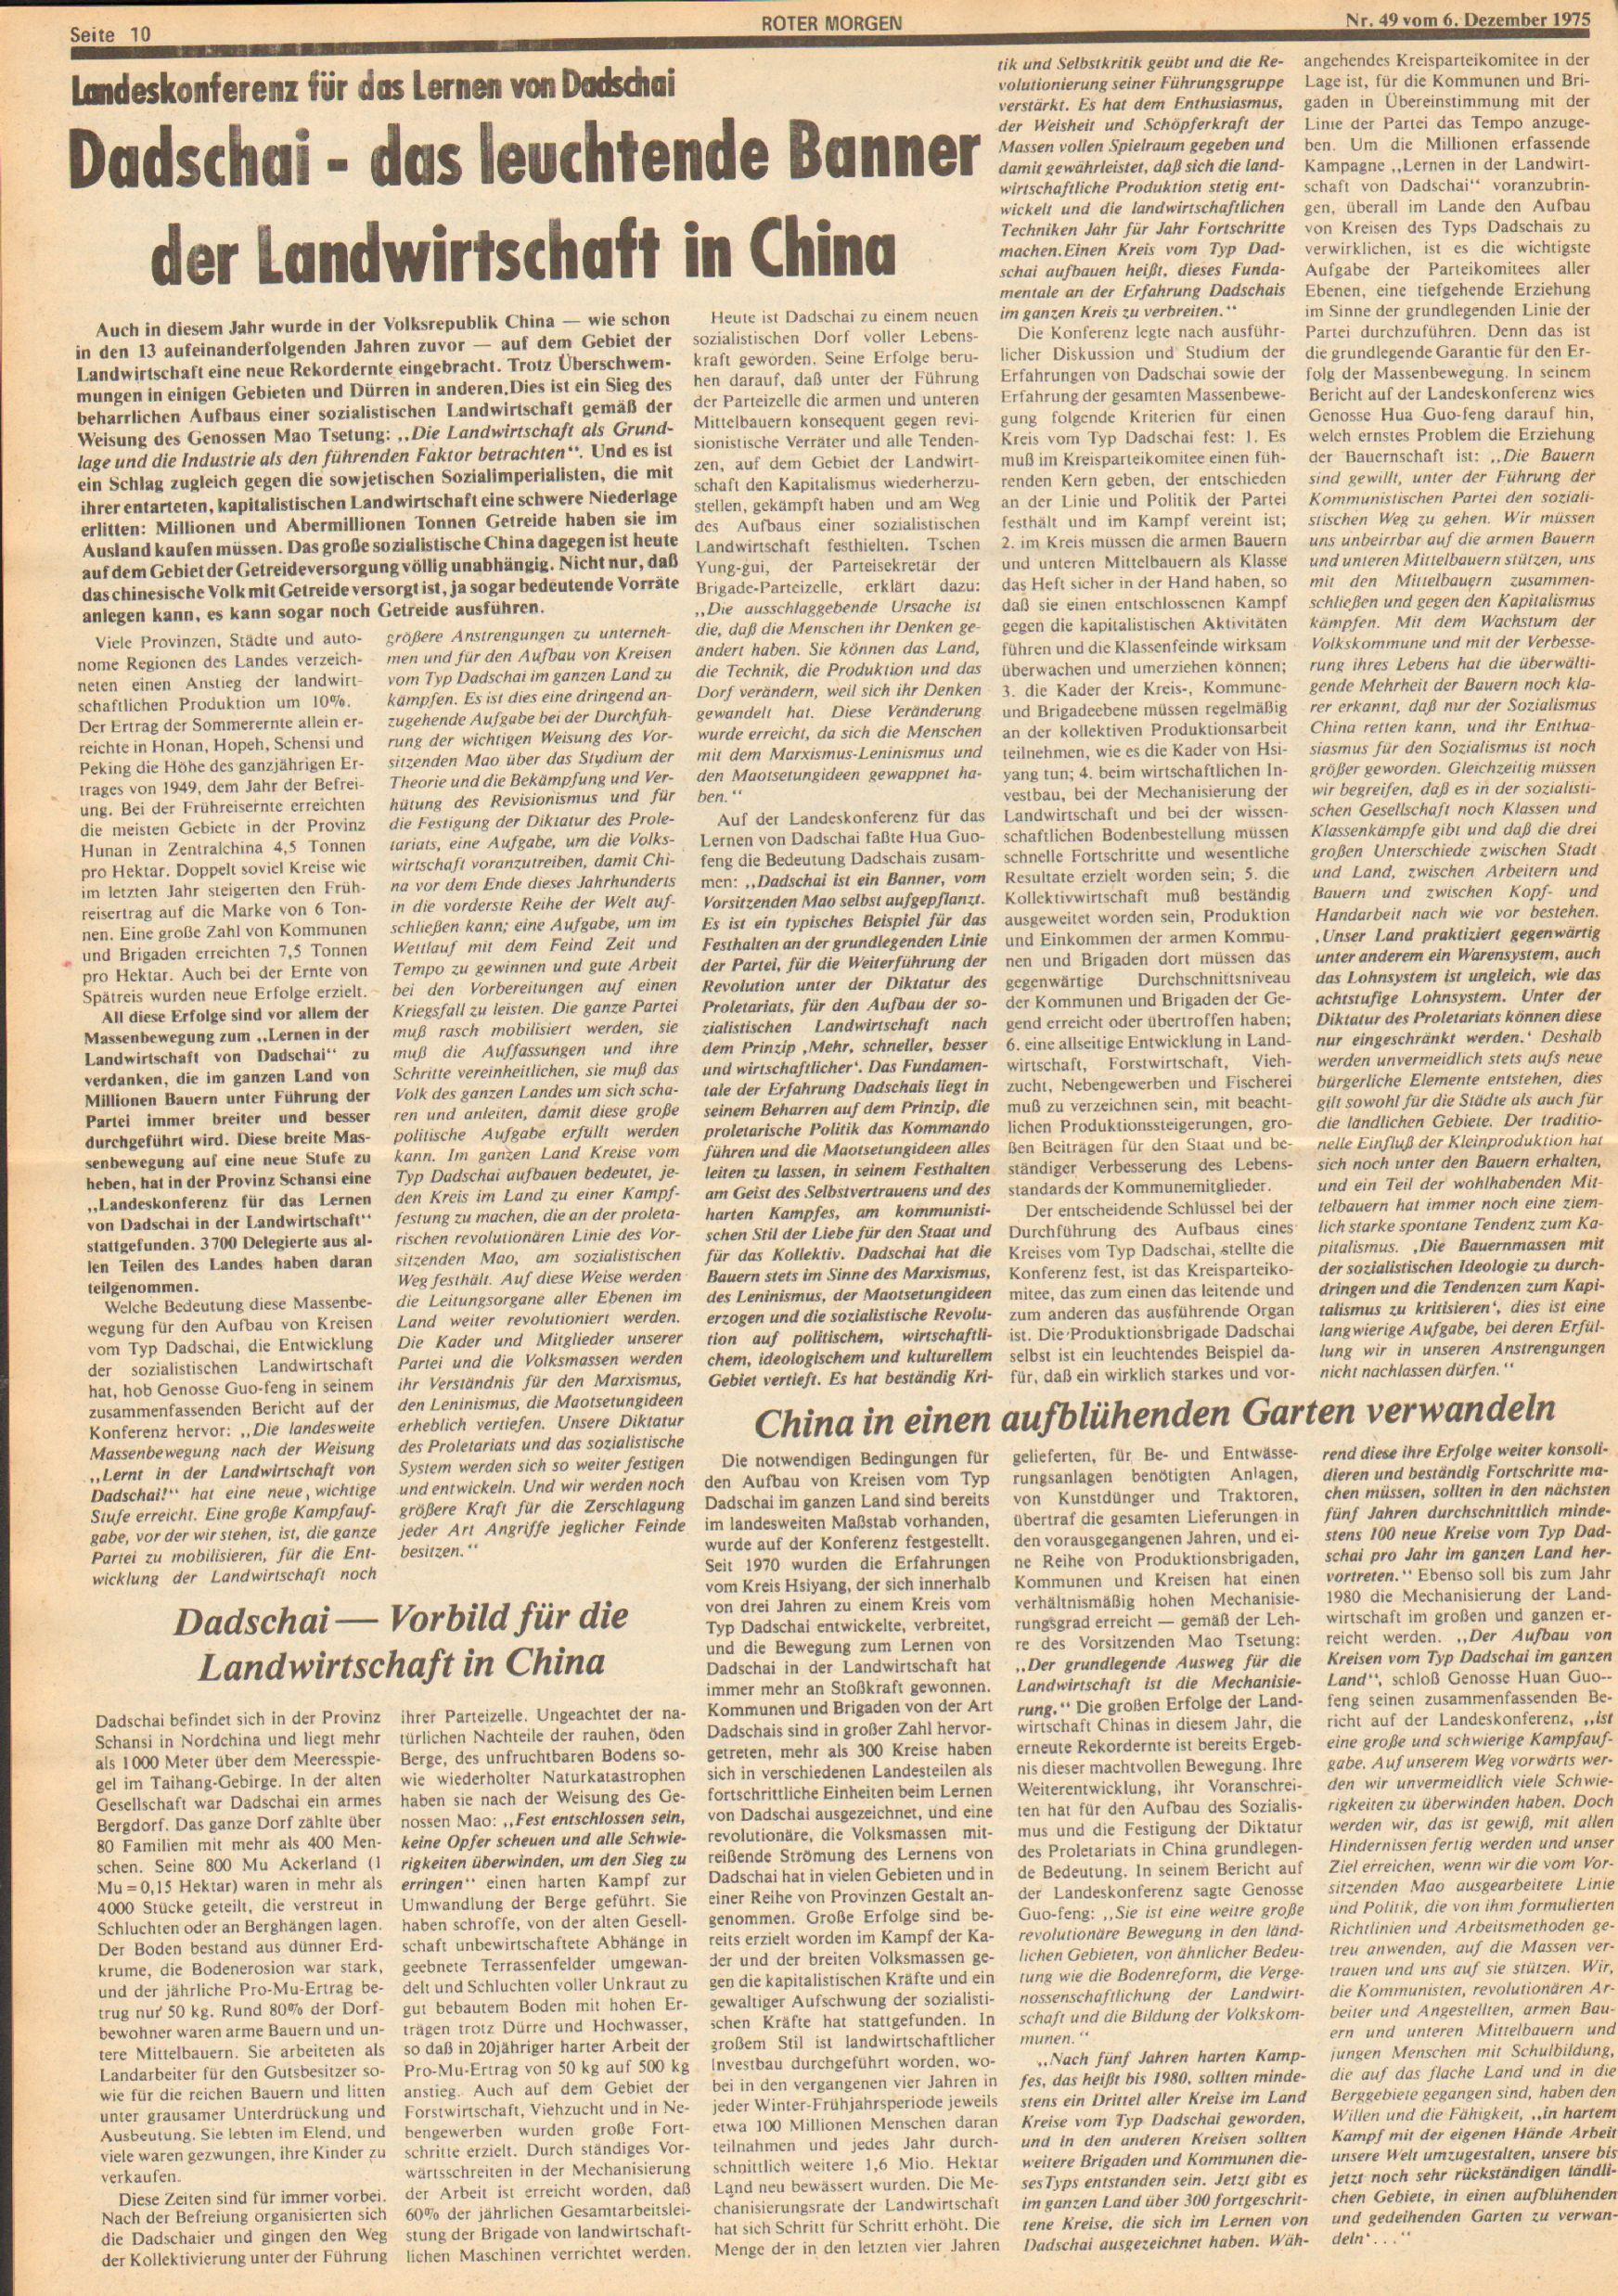 Roter Morgen, 9. Jg., 6. Dezember 1975, Nr. 49, Seite 10